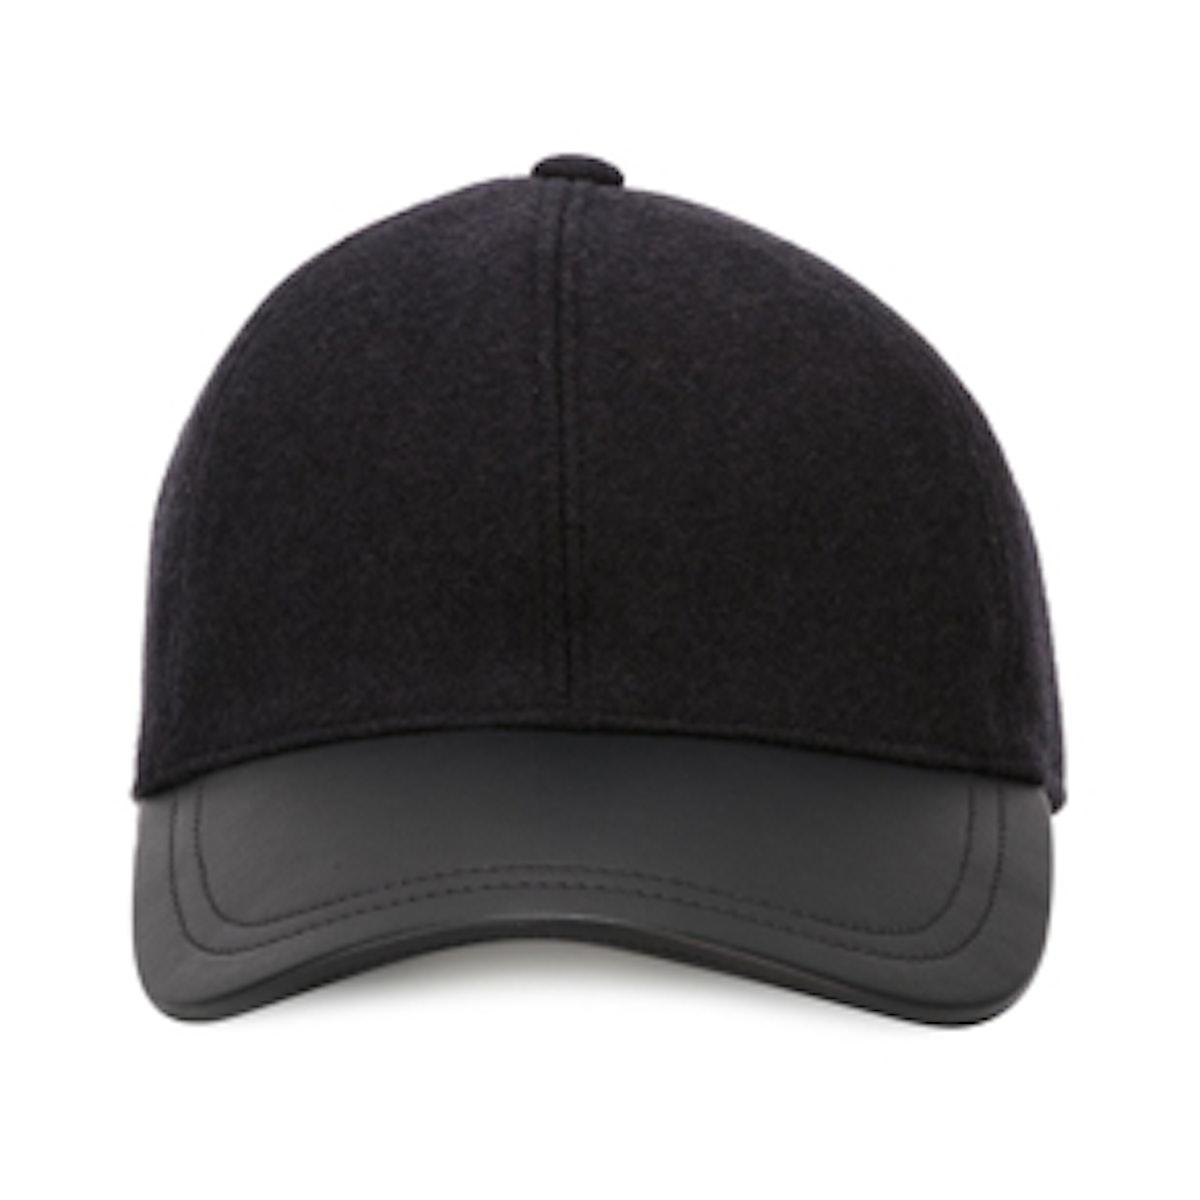 Leather Peak Baseball Cap